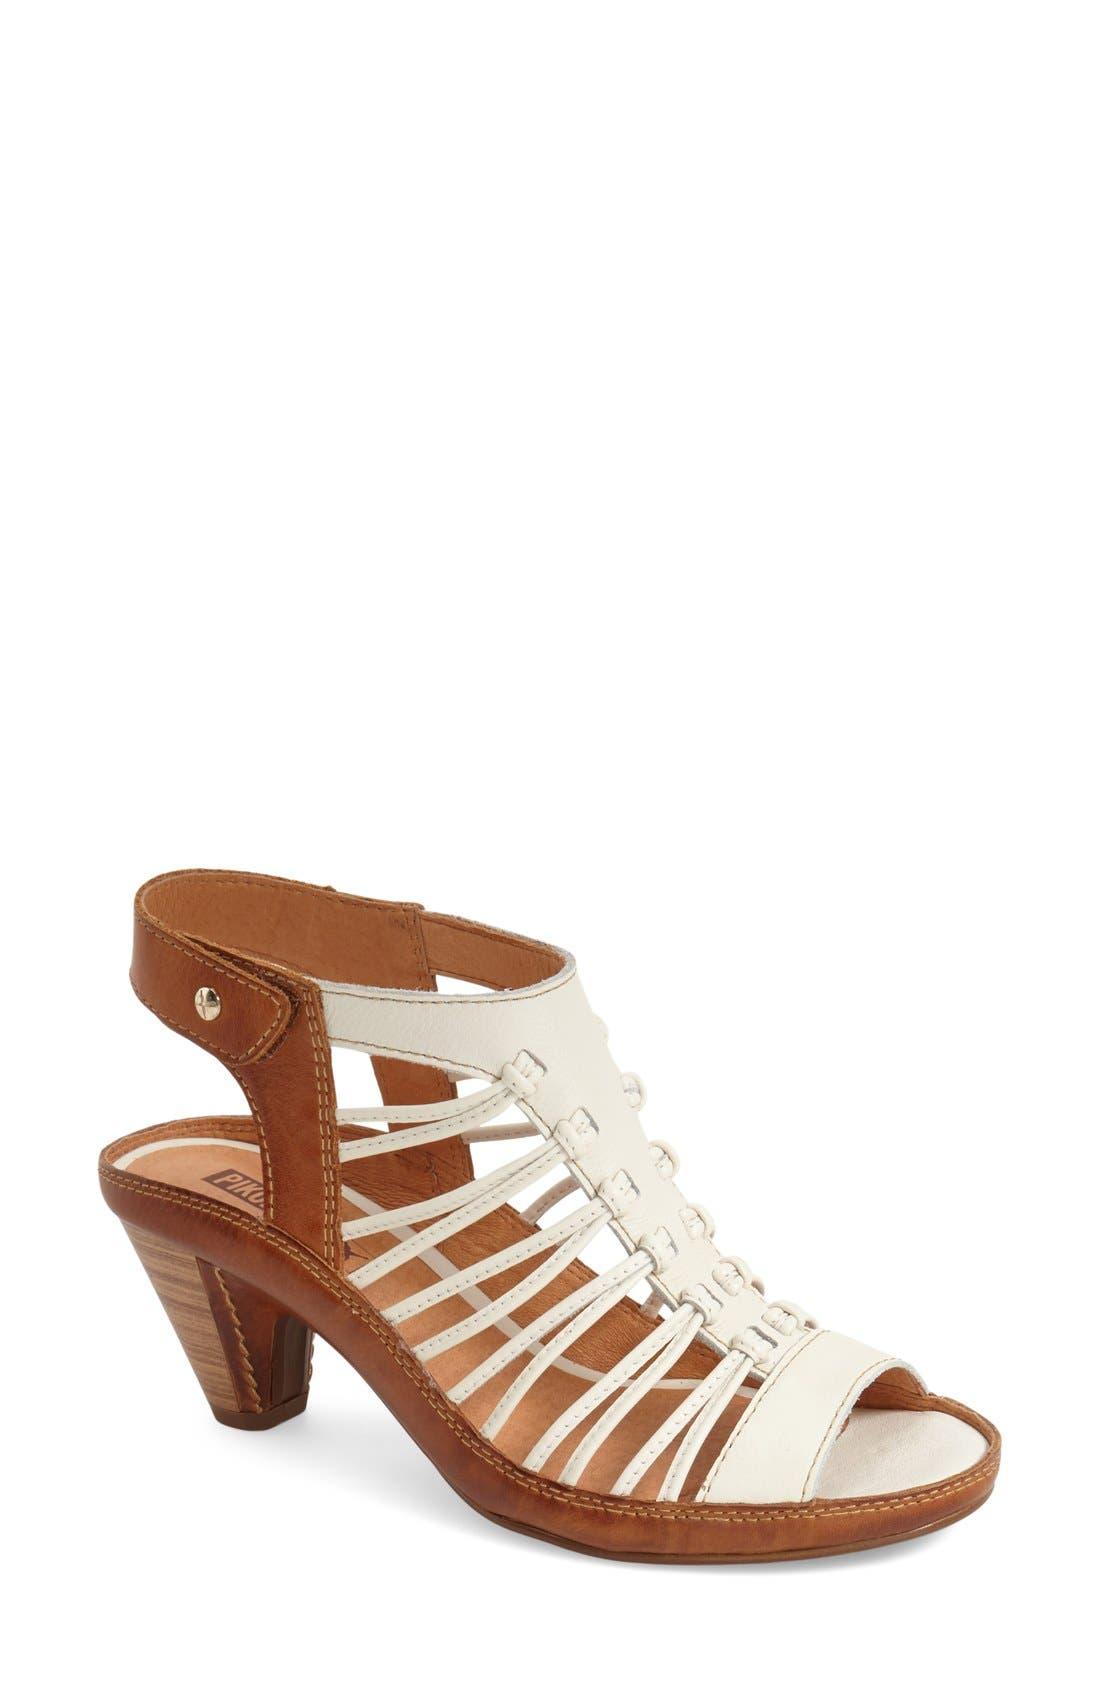 Main Image - PIKOLINOS 'Java' Sandal (Women)